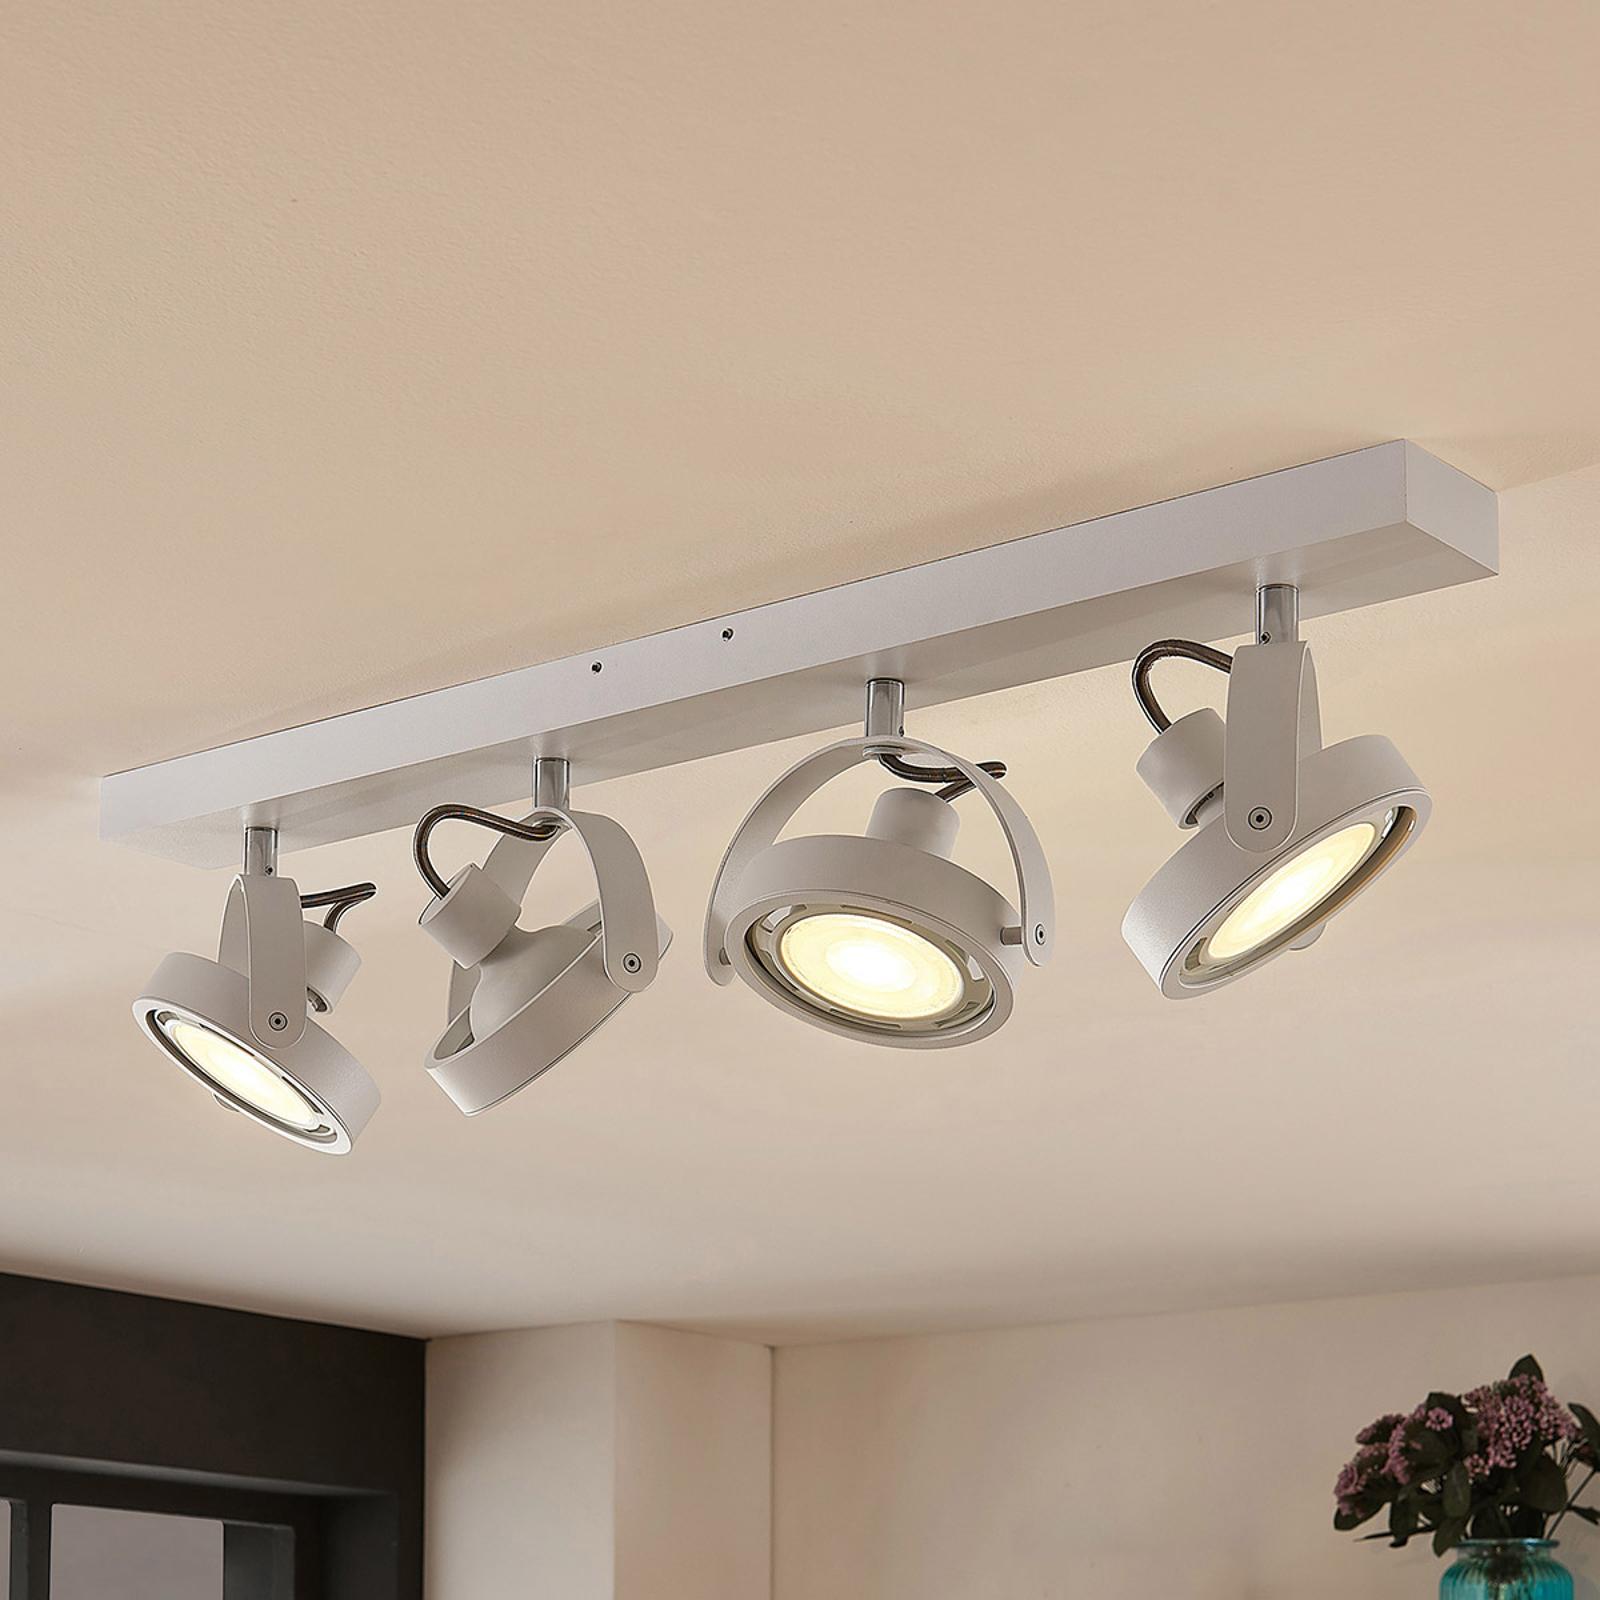 LED-Strahler Munin, dimmbar, weiß, 4-flammig